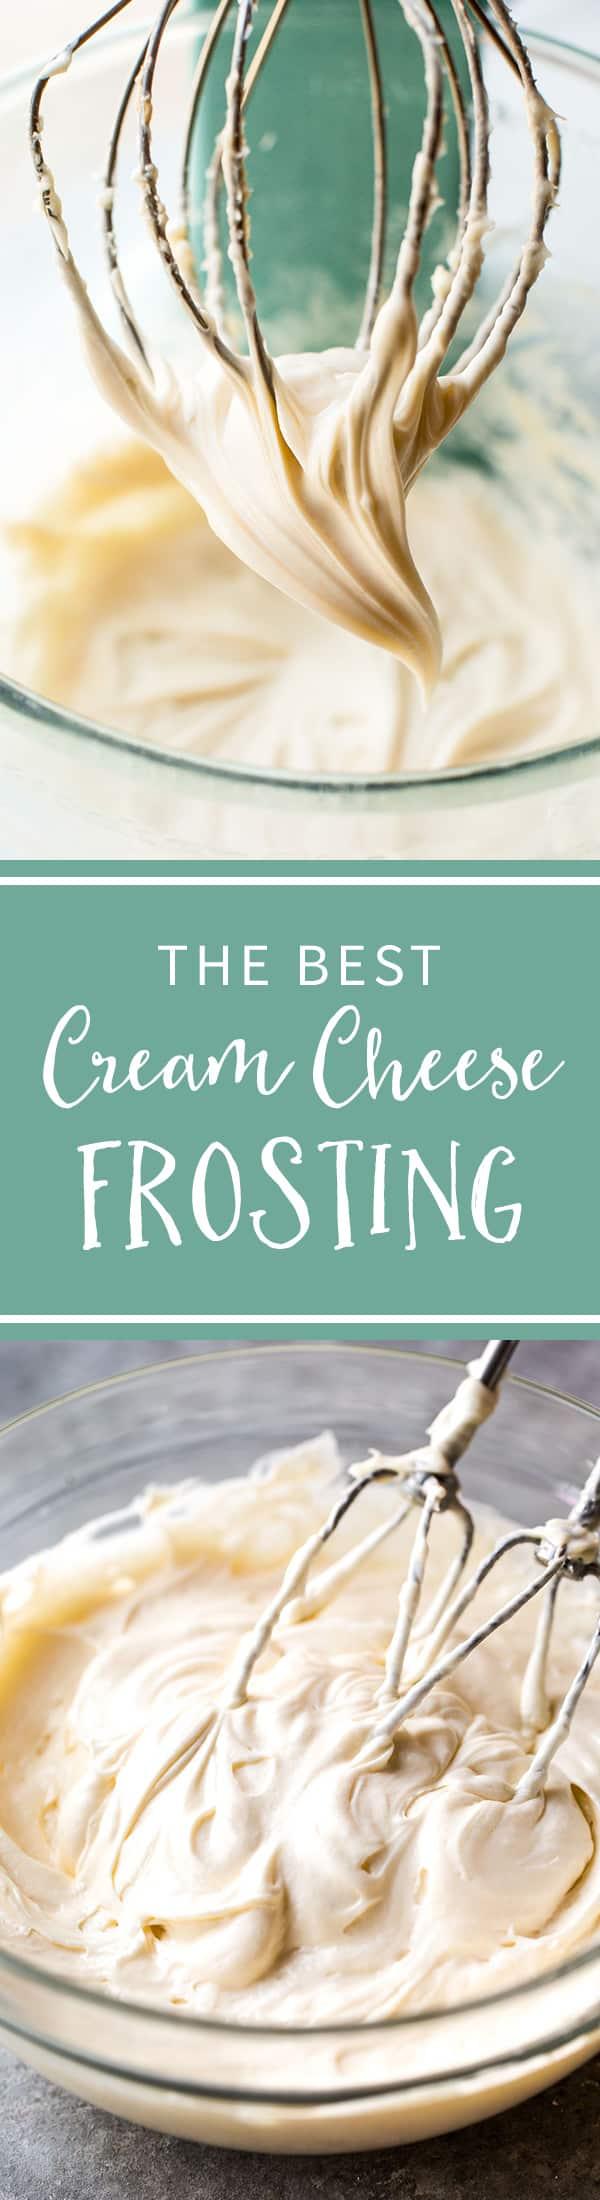 The CREAMIEST and easiest cream cheese frosting recipe! Recipe on sallysbakingaddiction.com